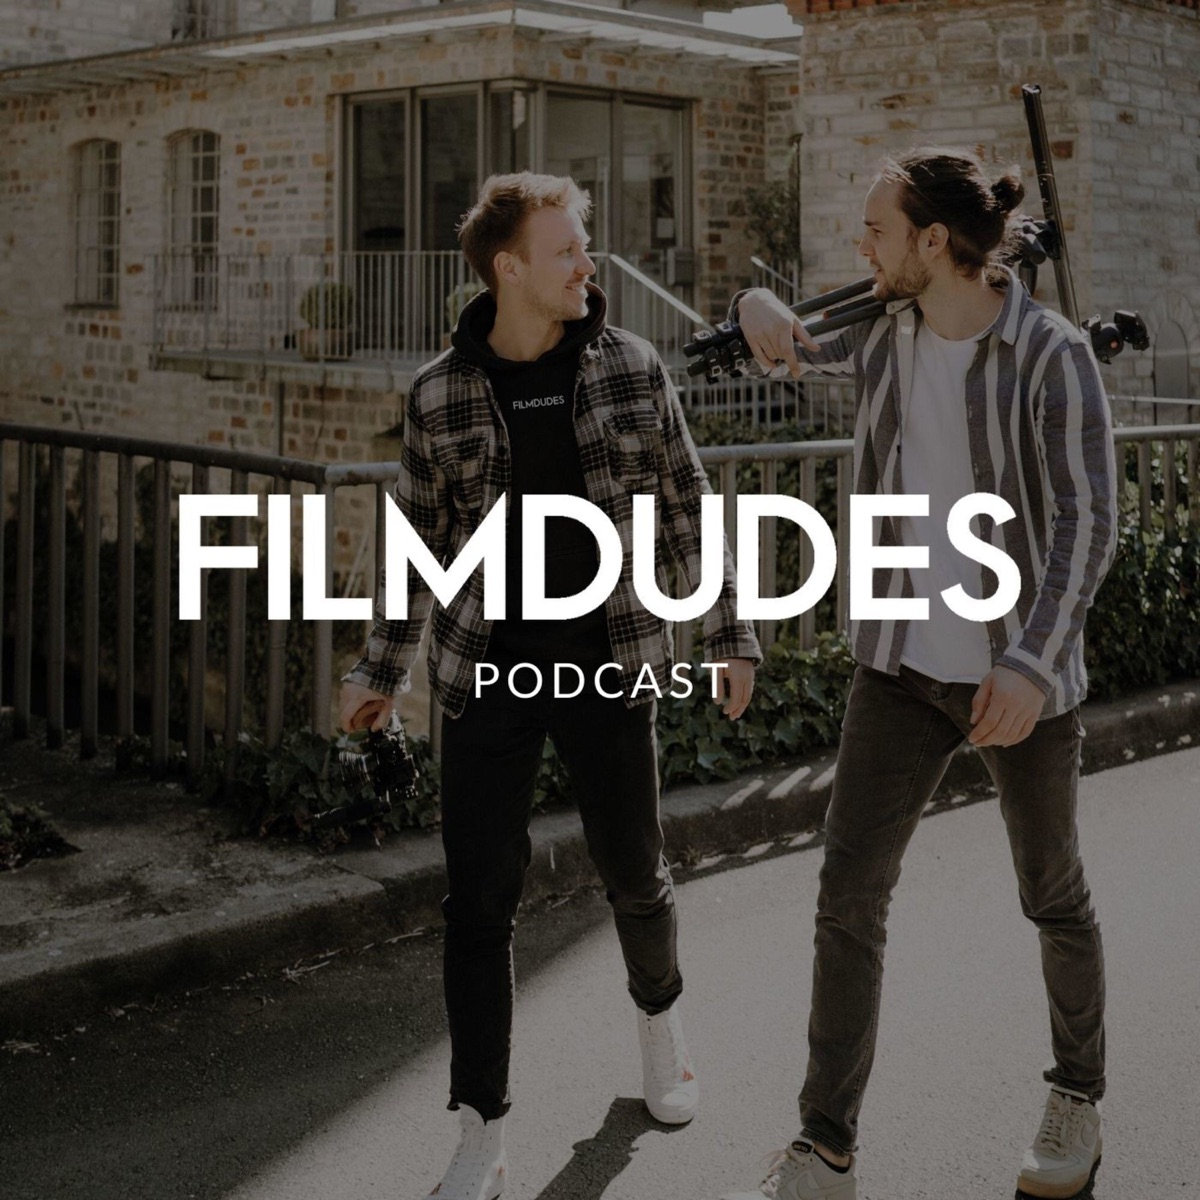 FILMDUDES Podcast